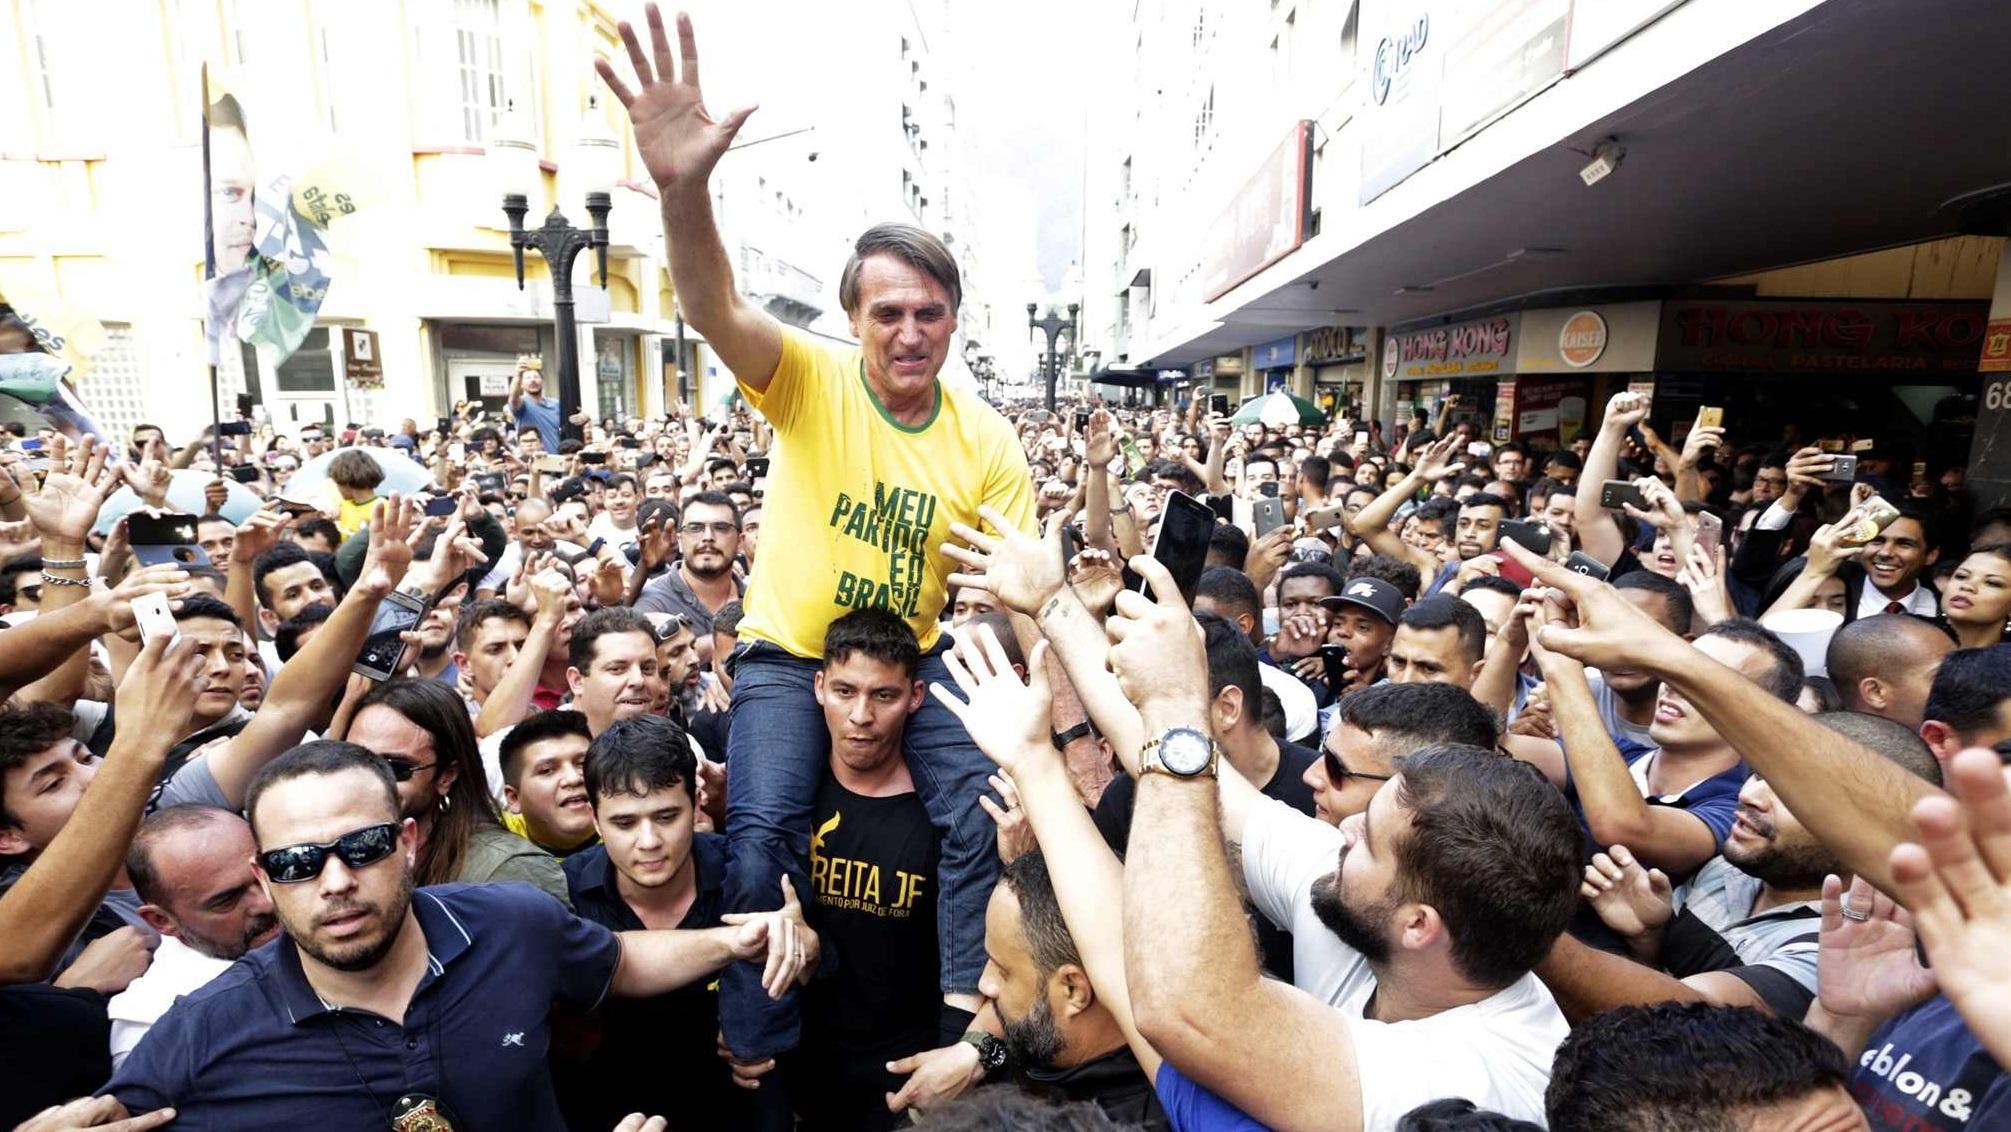 brasilisk_praesidentkandidat.jpg